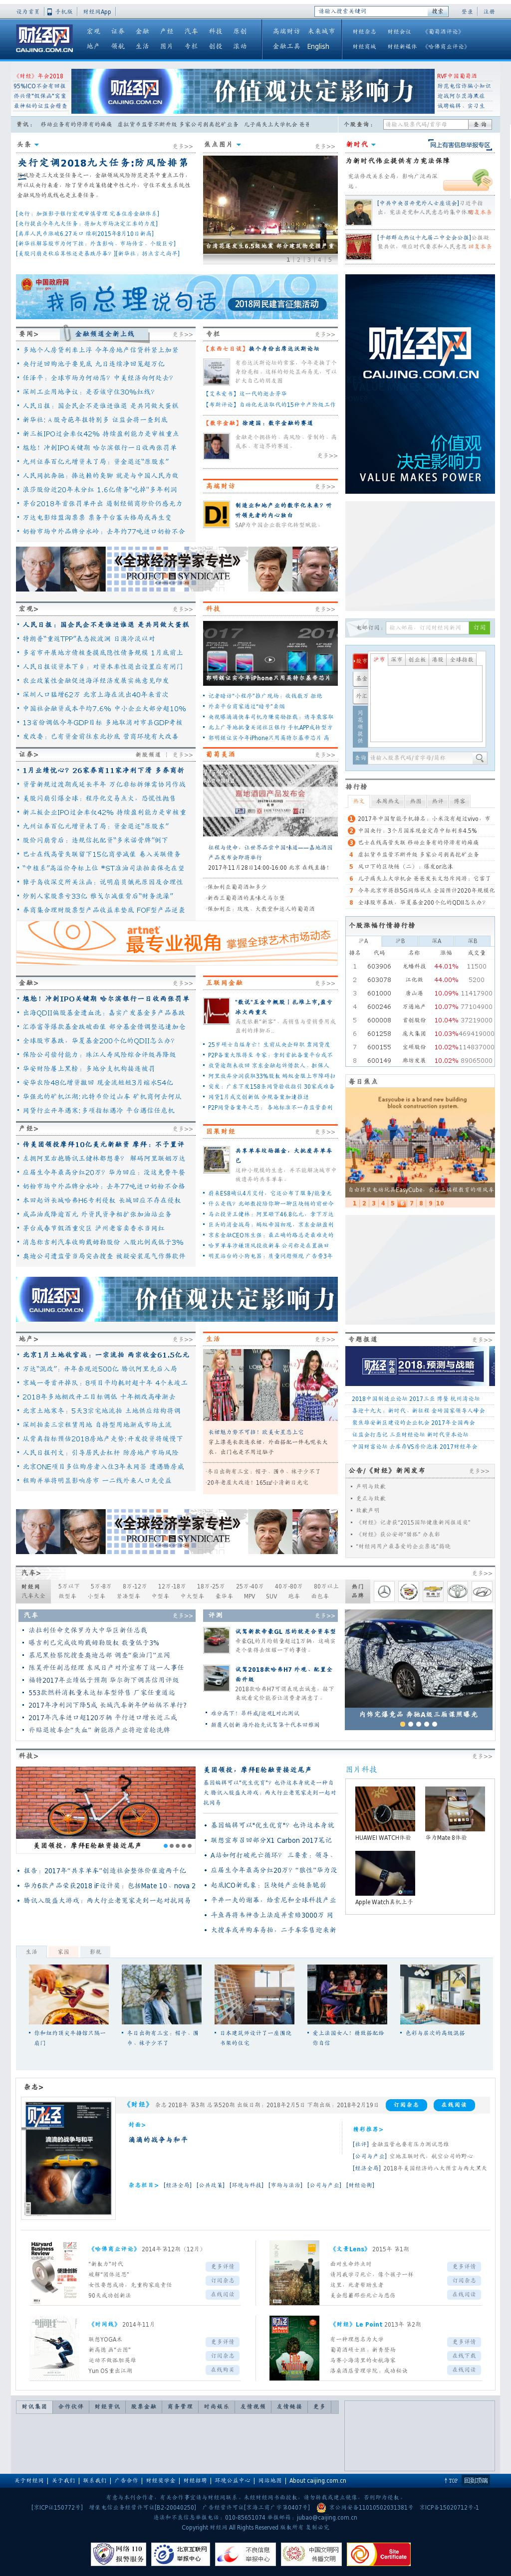 Caijing at Wednesday Feb. 7, 2018, 5:01 a.m. UTC